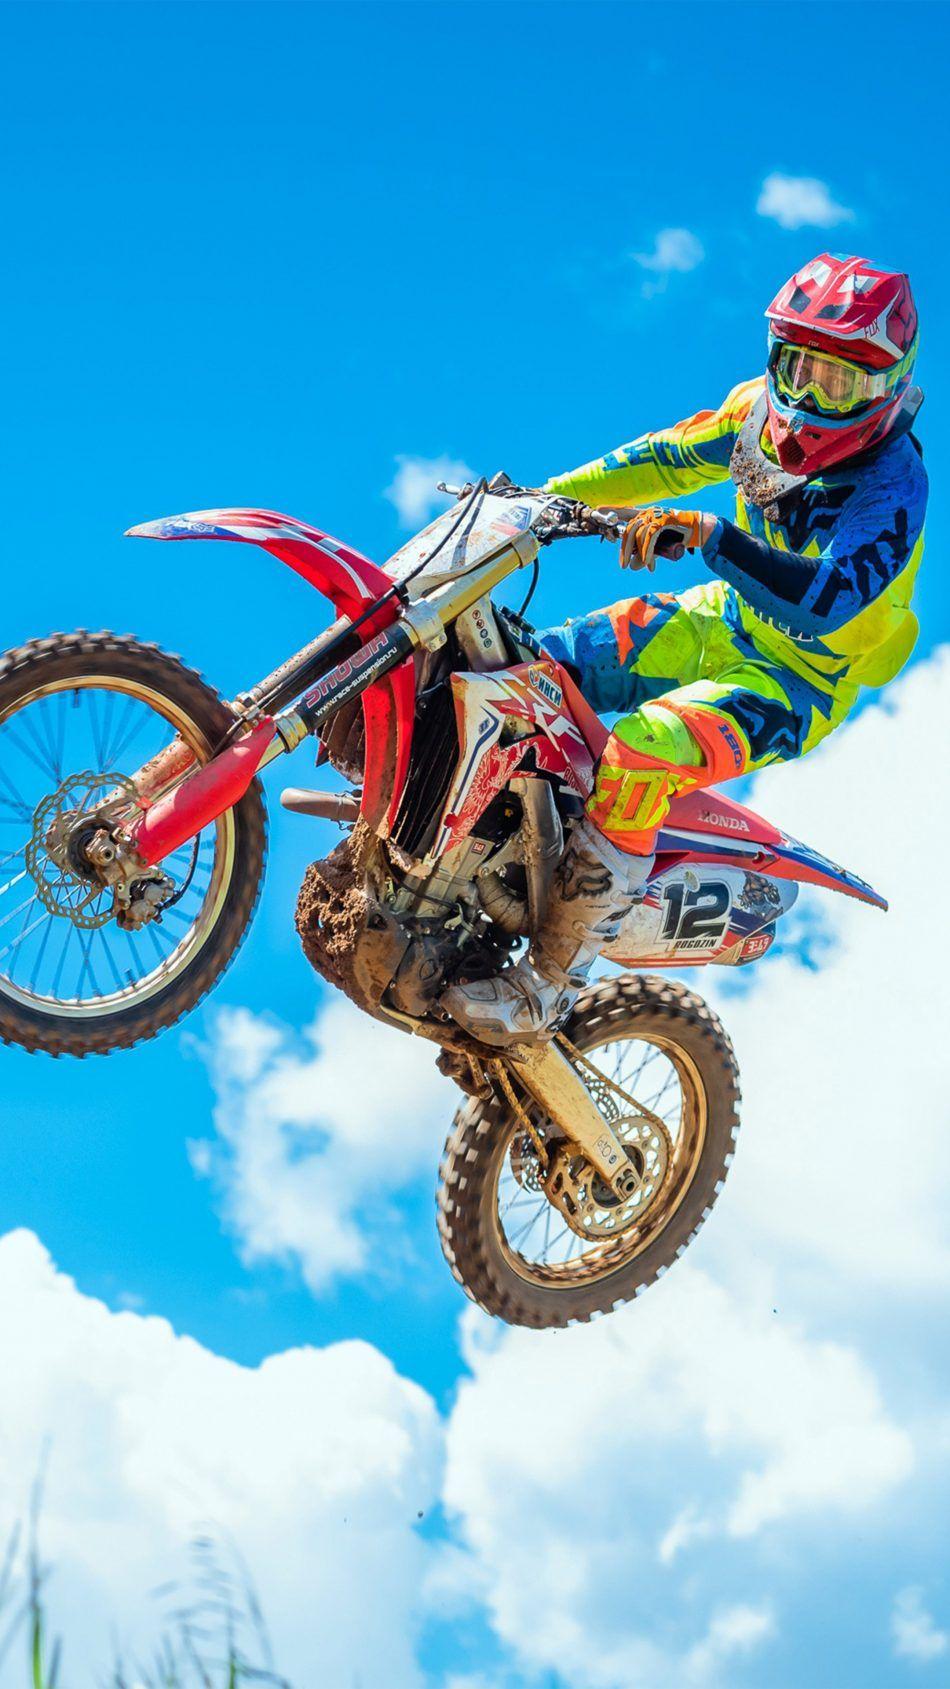 Download Wallpaper Motor Cross : download, wallpaper, motor, cross, Motorcycle, Motocross, Sports, Ultra, Mobile, Wallpaper, Enduro, Motocross,, Love,